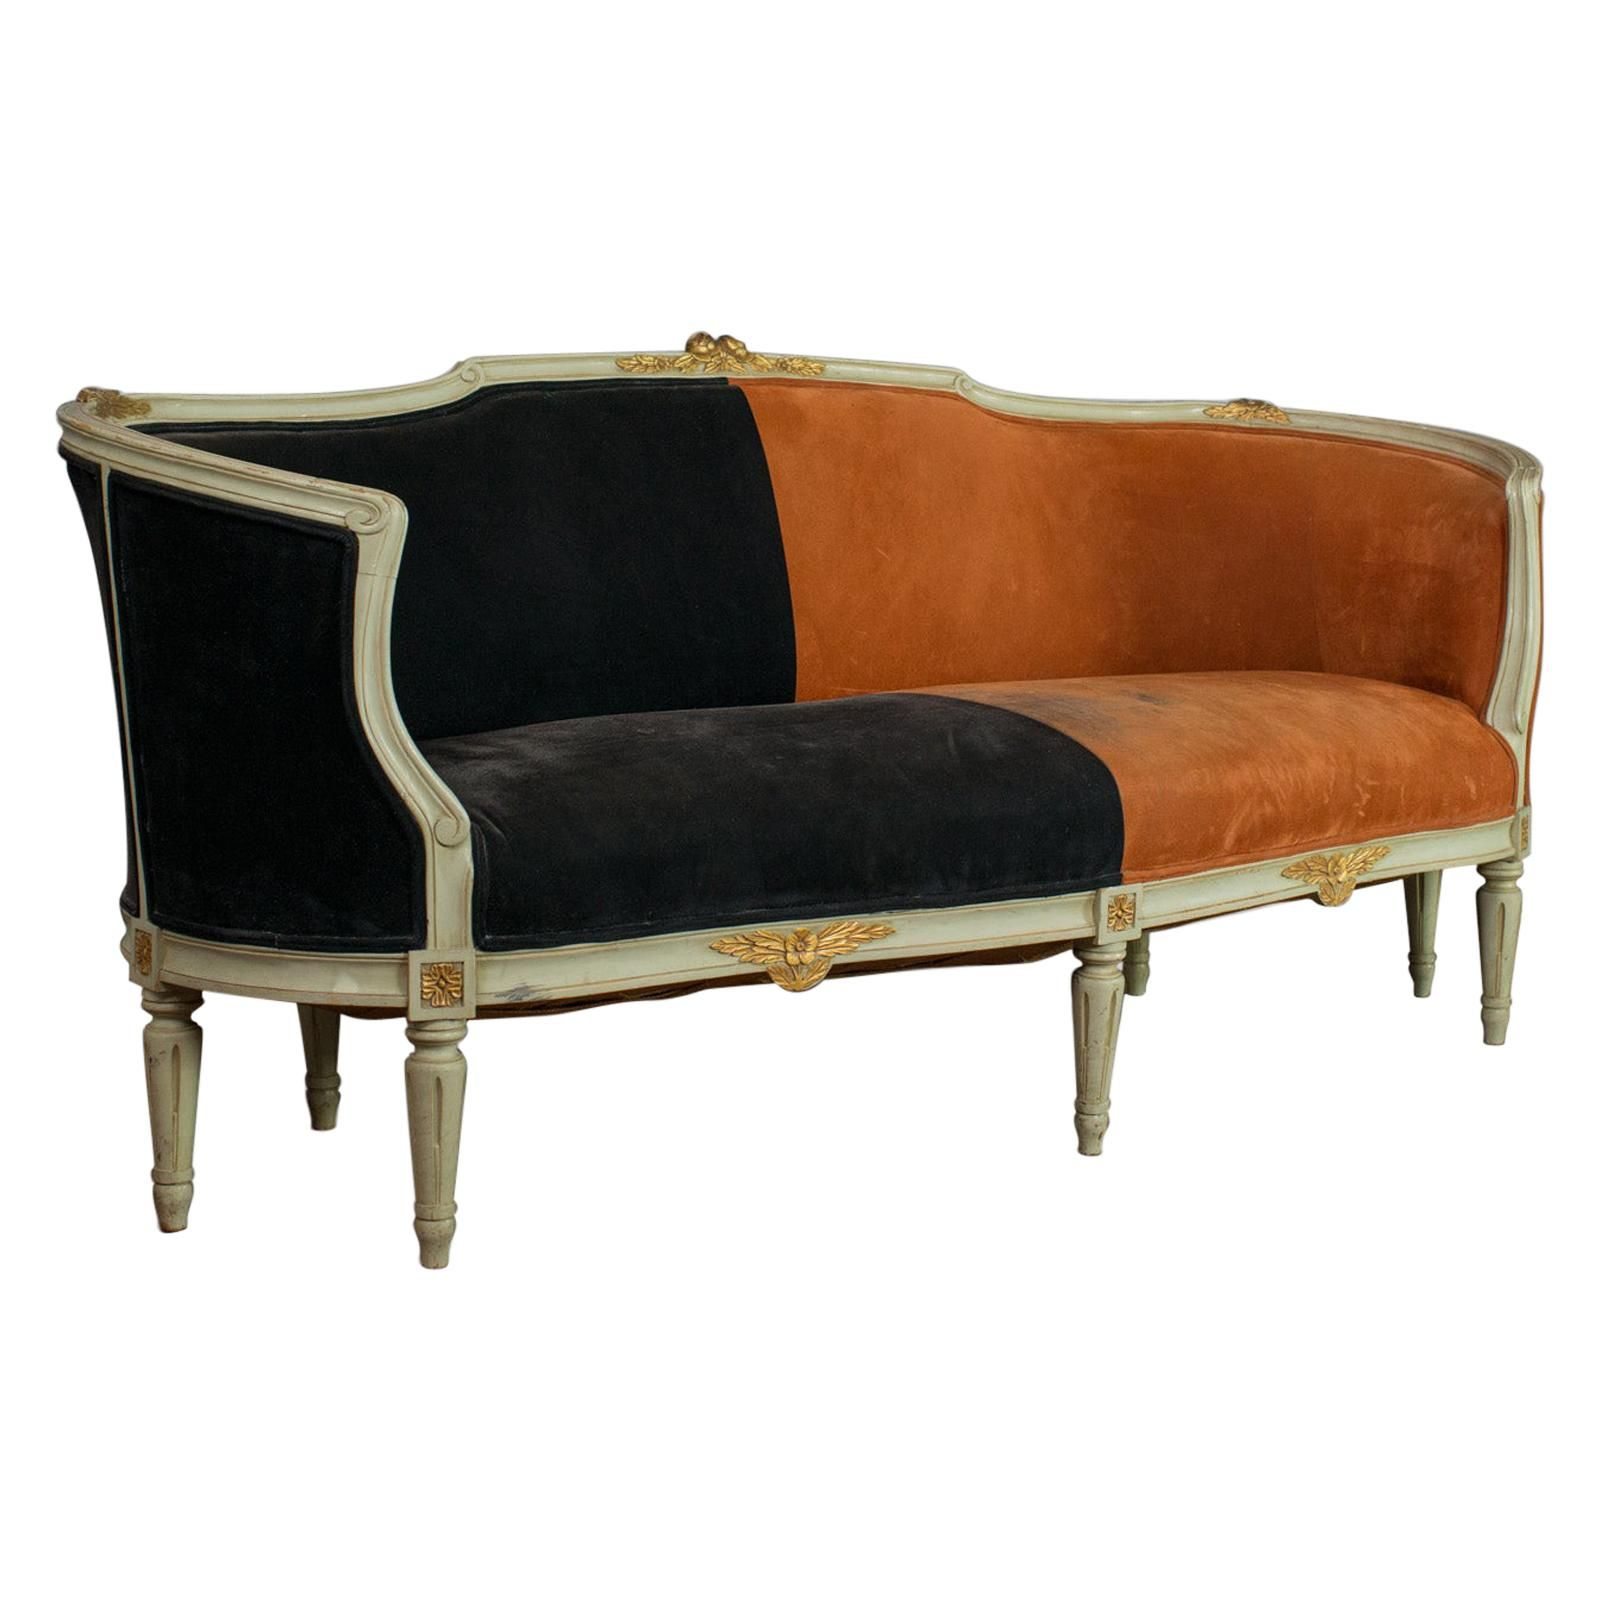 Full Size of Canape Sofa Luxus Schillig Riess Ambiente Schlaffunktion Xora Garnitur 3 Teilig Hülsta Rahaus Höffner Big Ewald Sofa Canape Sofa